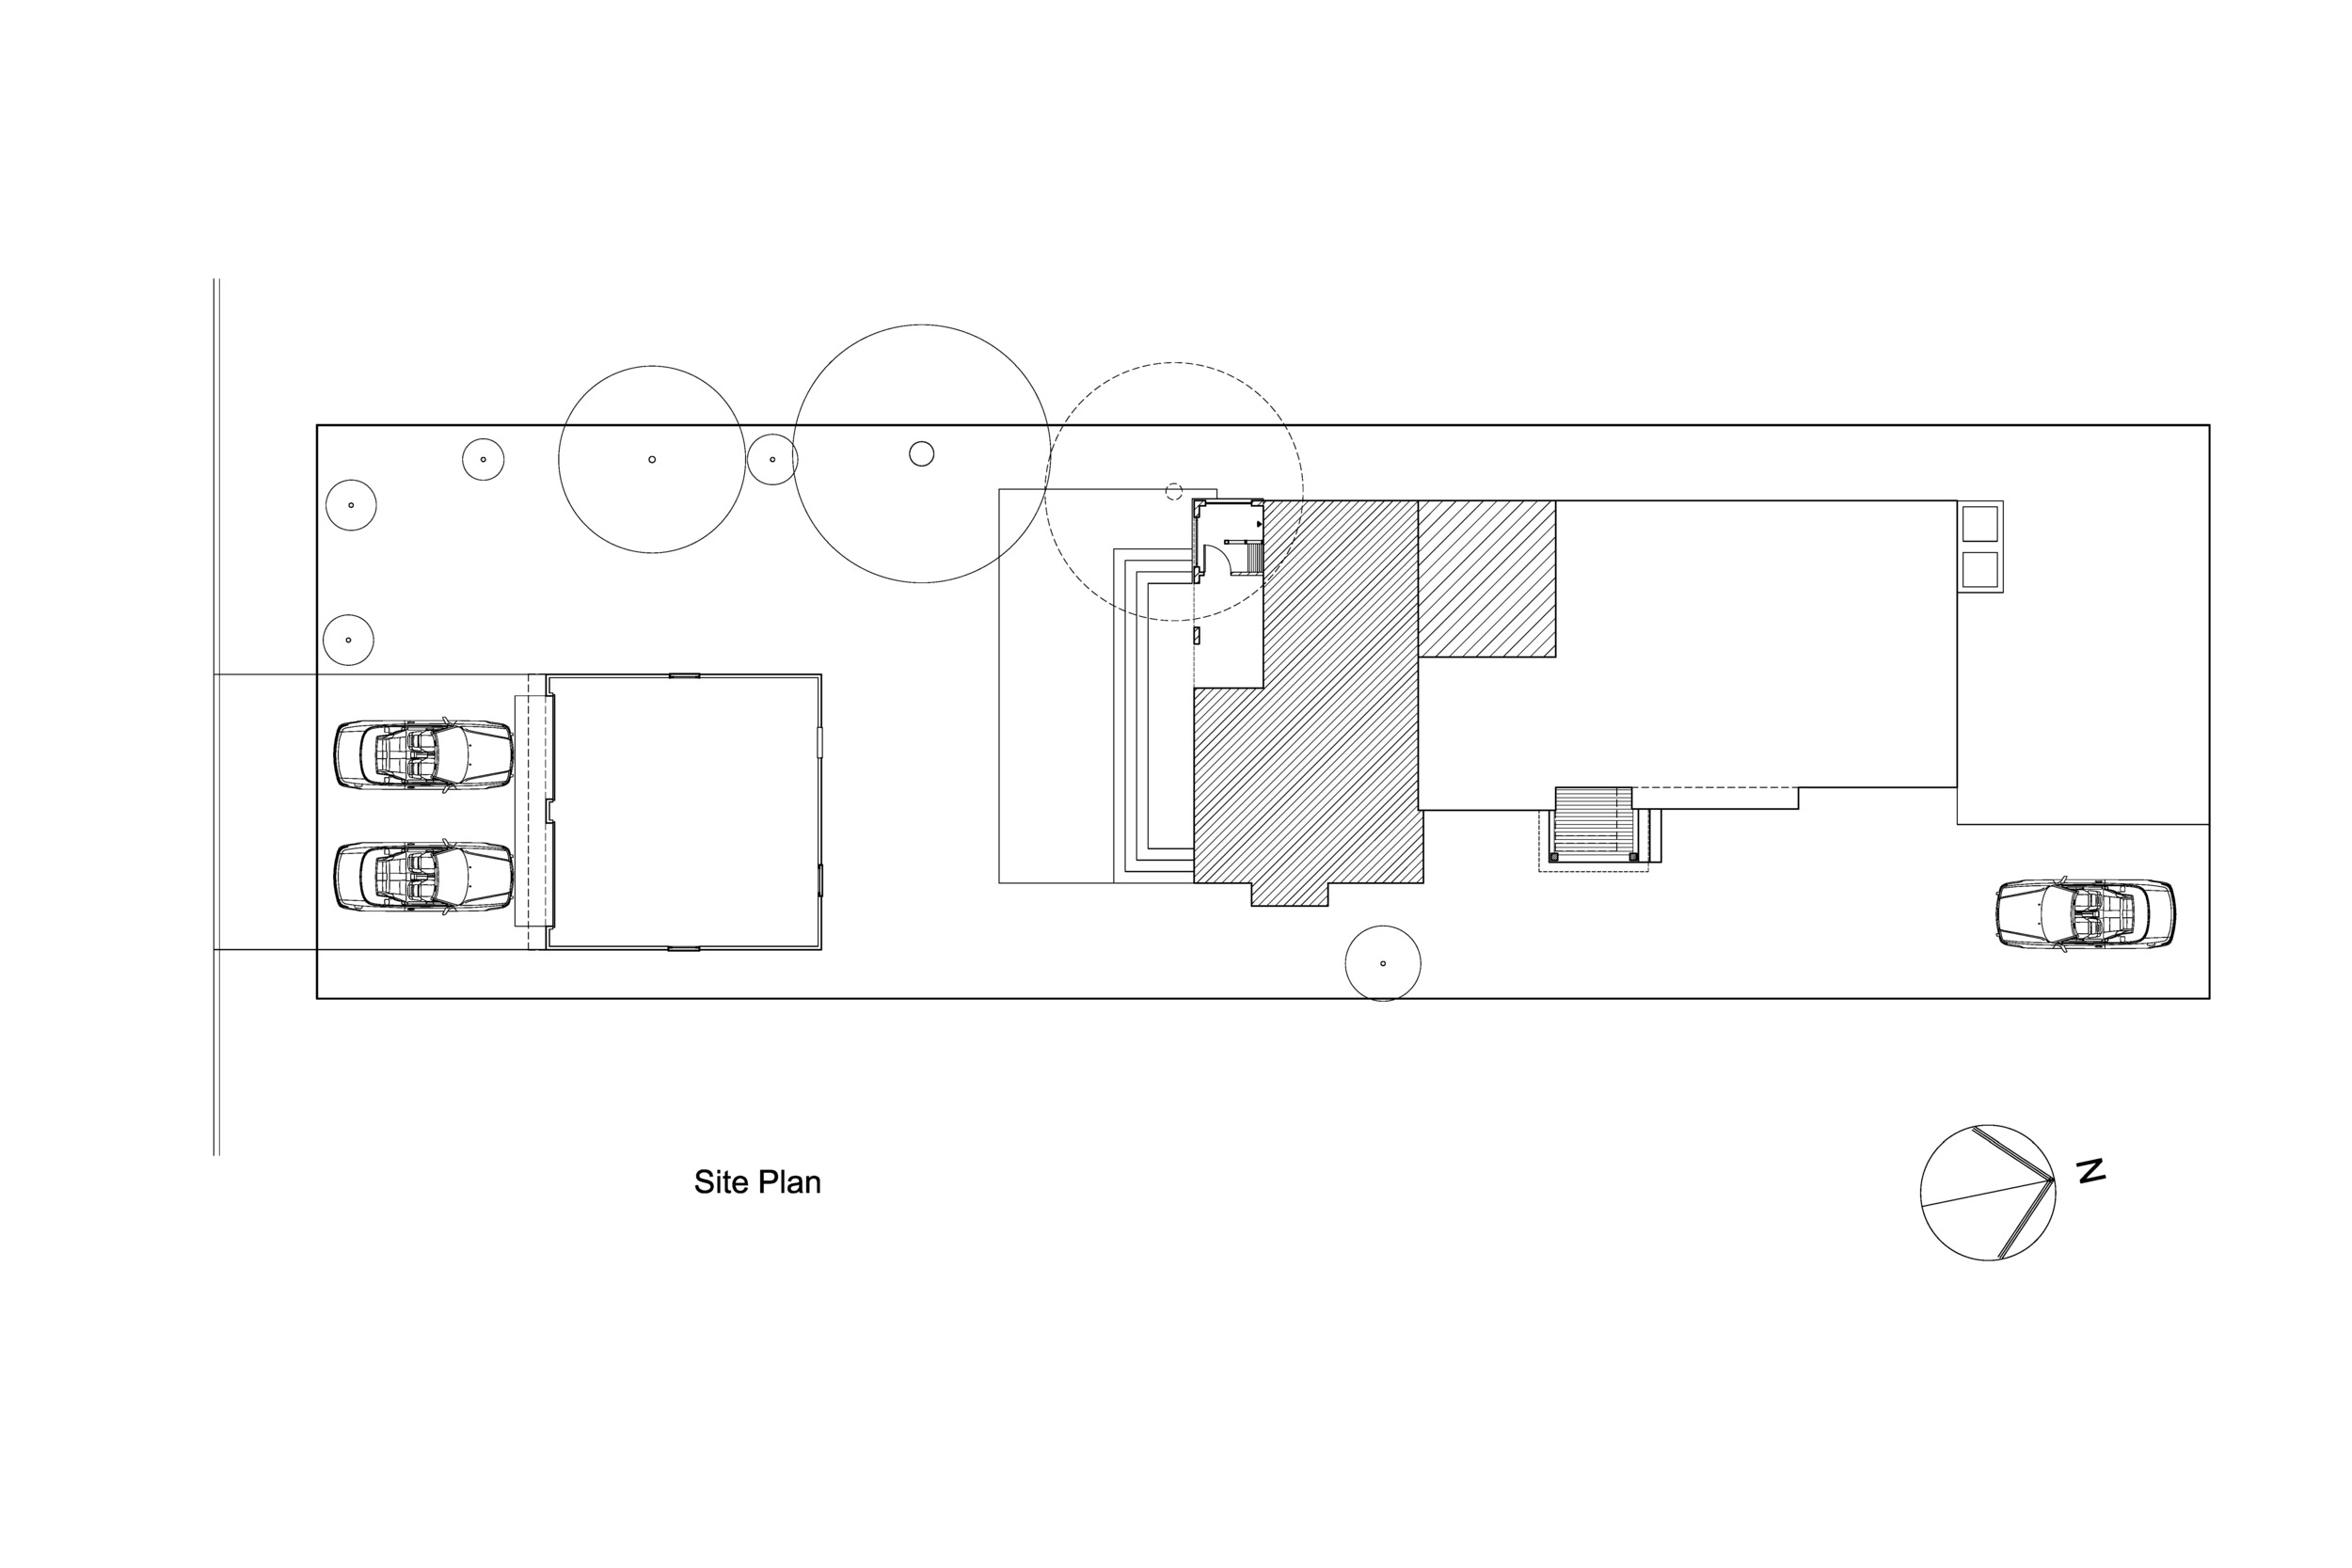 kruse_site_plan.jpg